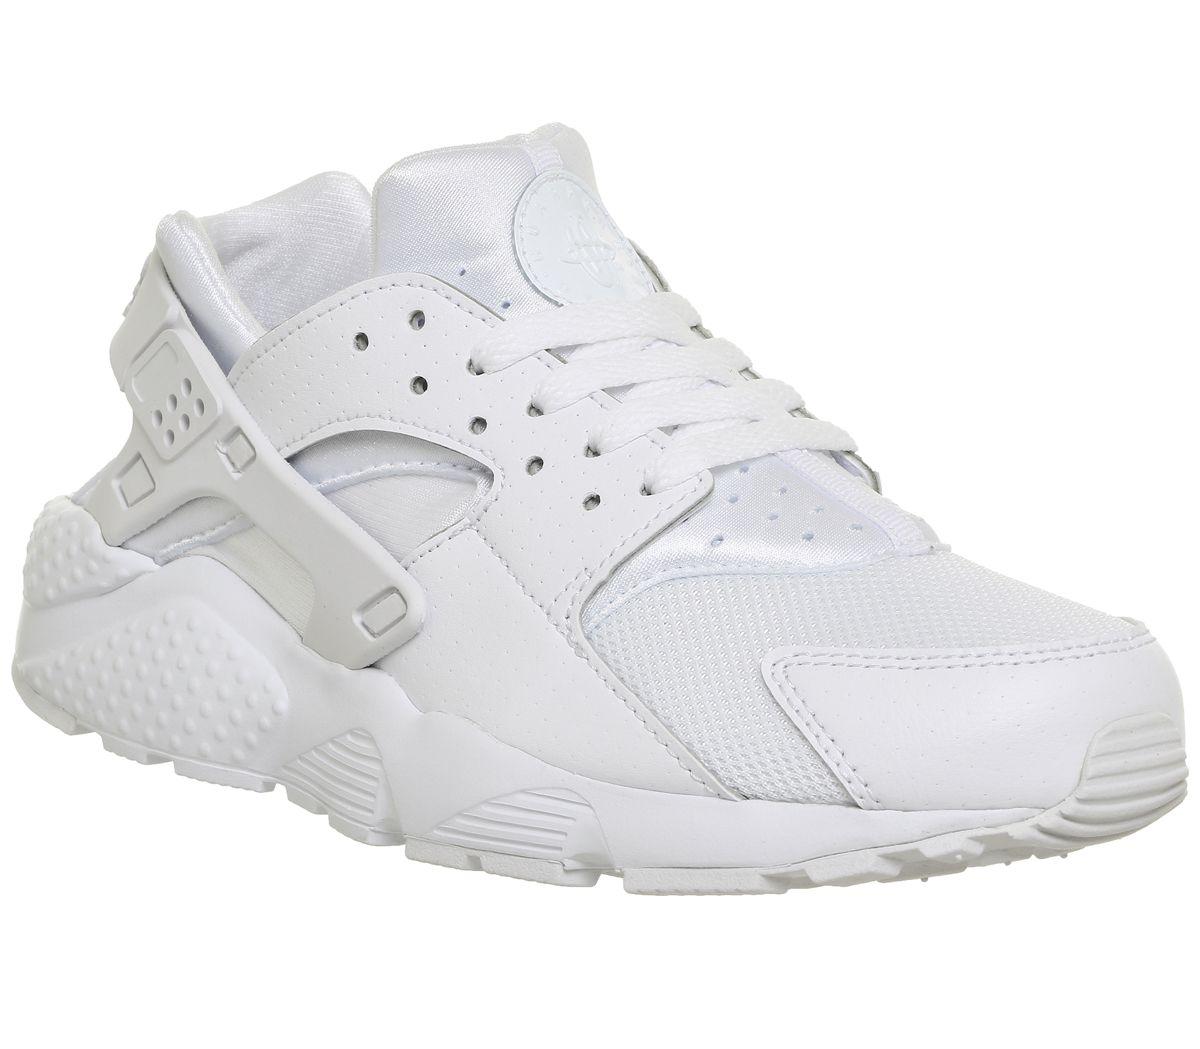 bef67e03ab39 Nike Huarache Trainers White - Unisex